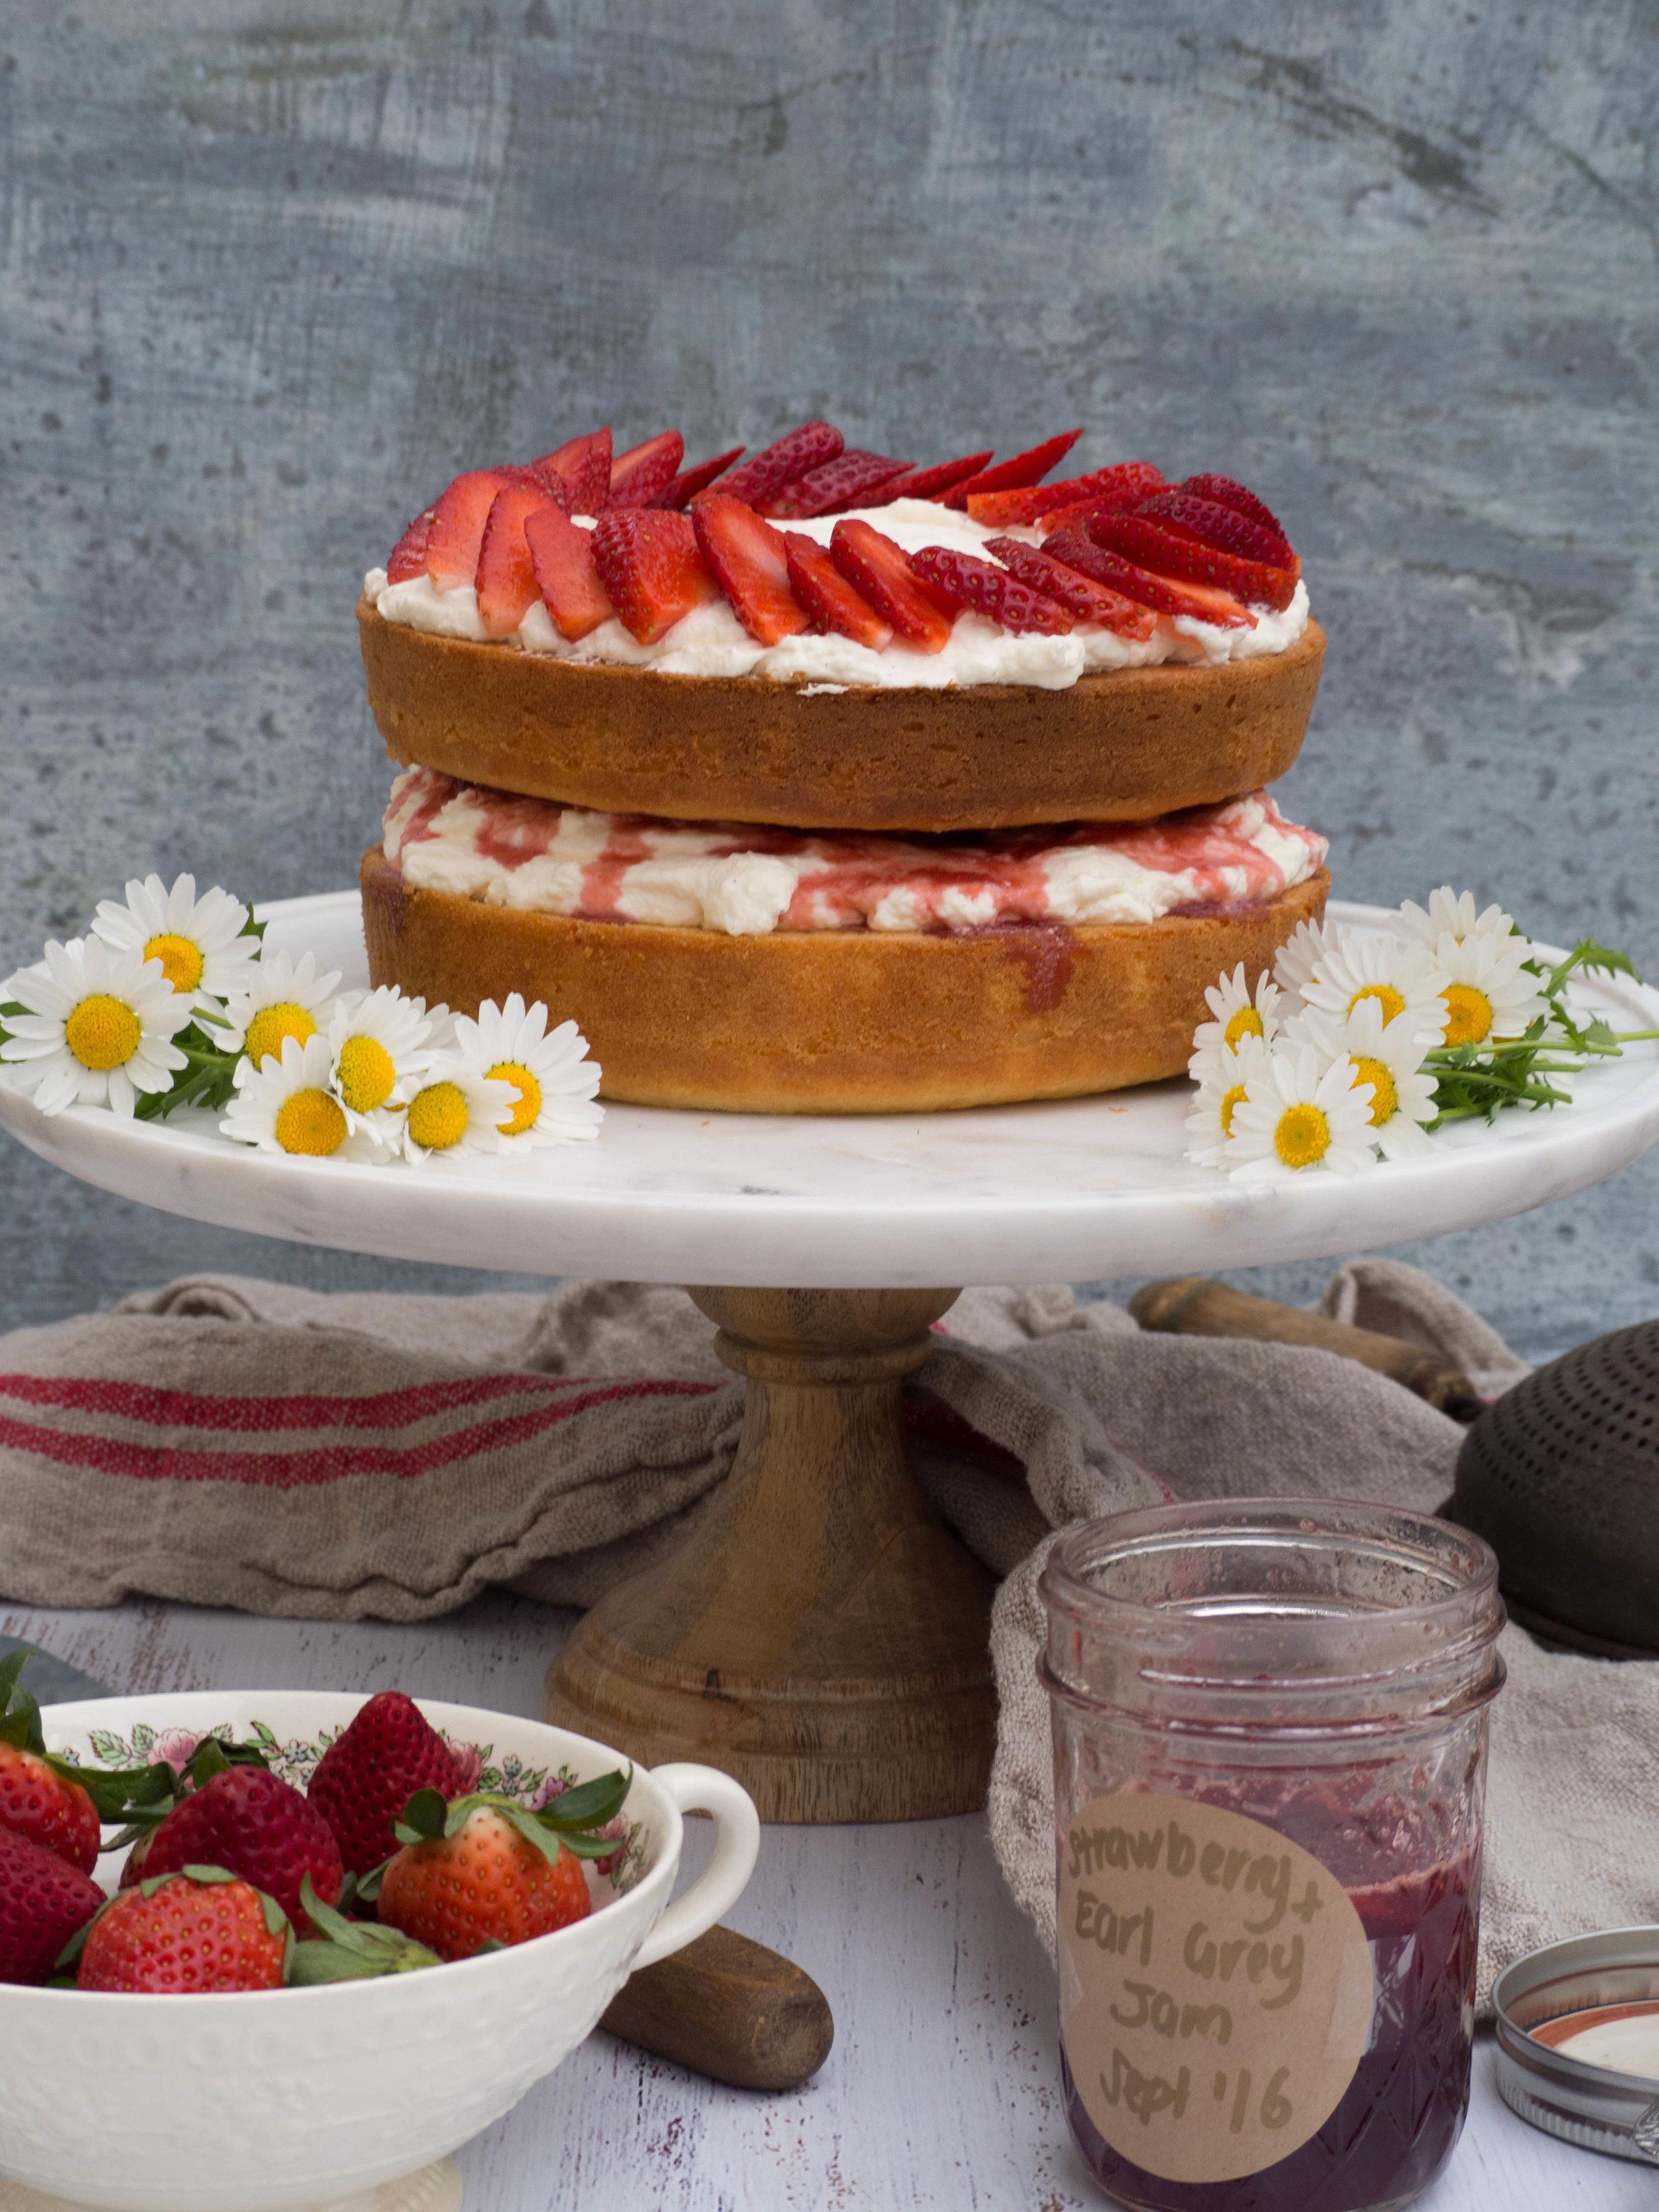 Strawberry & Earl Grey Cake